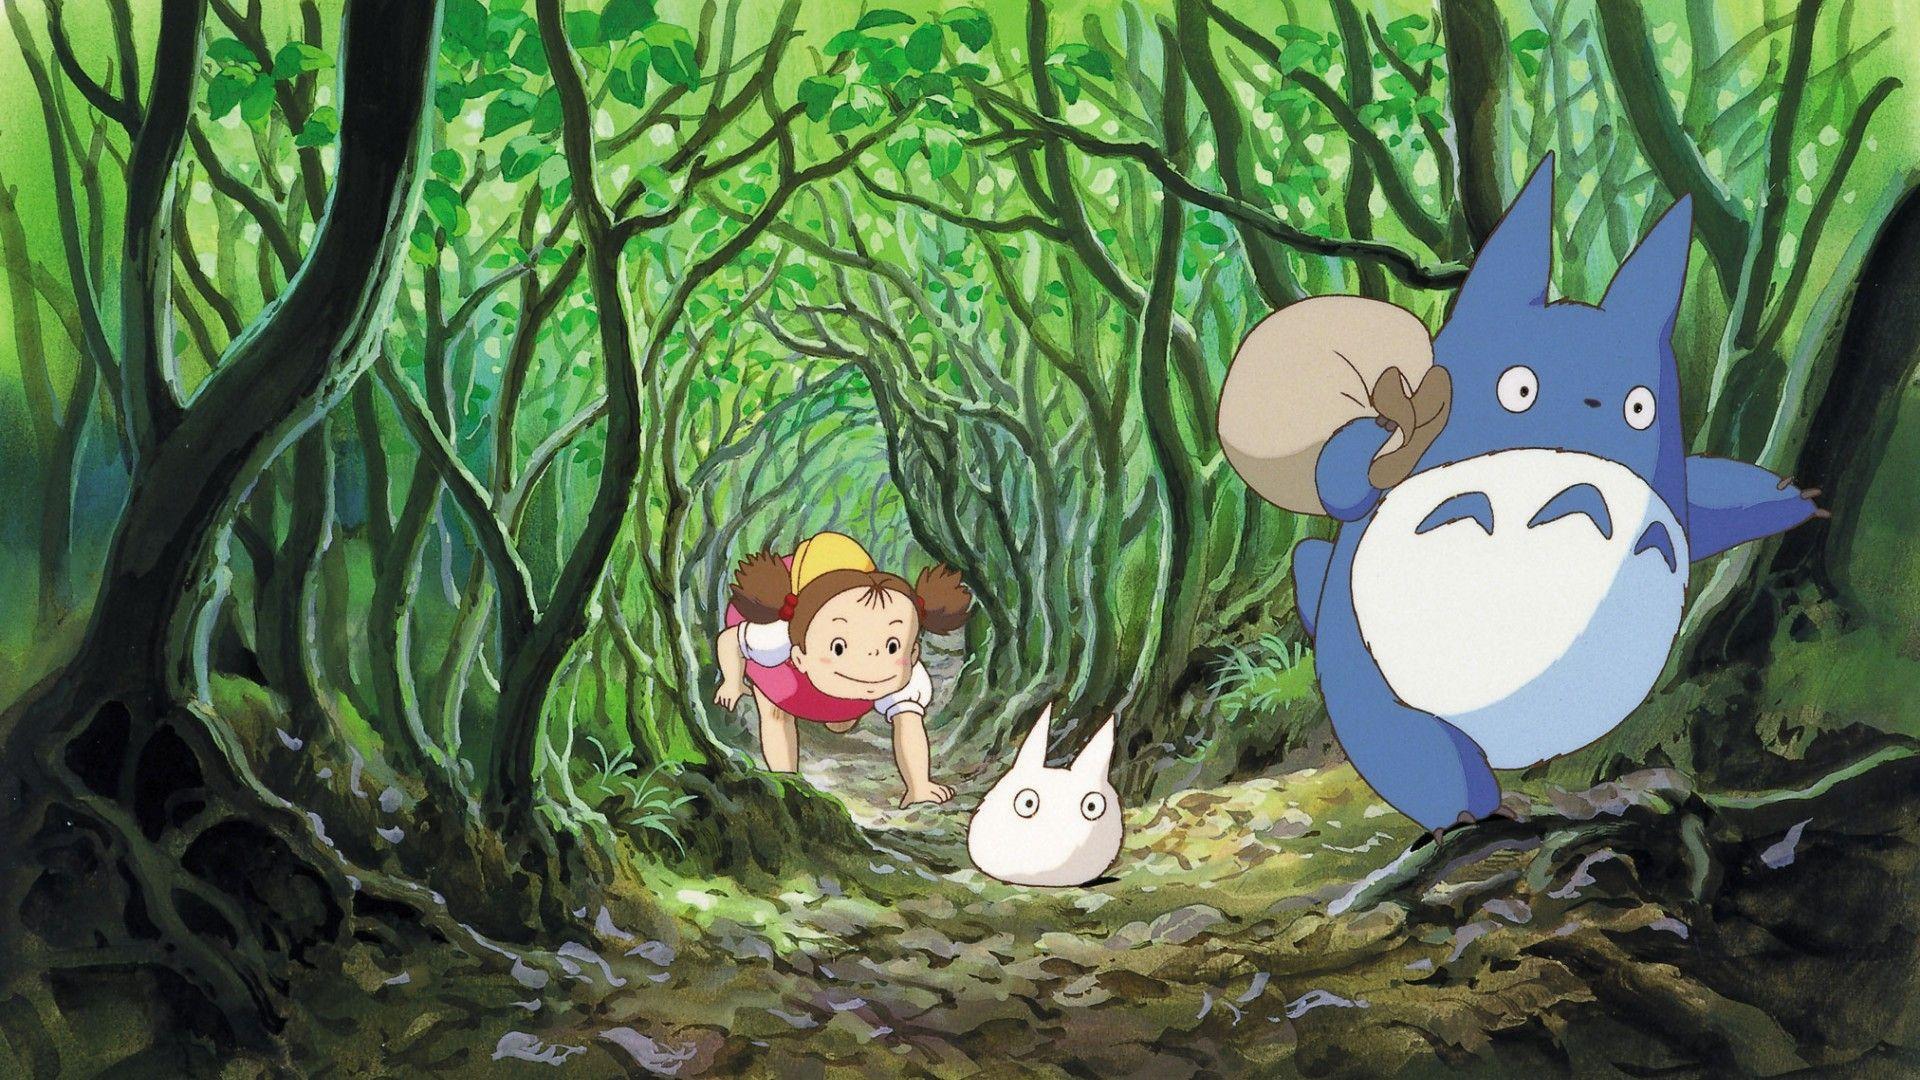 Màn hình 1920x1080Heaven: Hayao Miyazaki My Neighbor Totoro Studio Ghibli